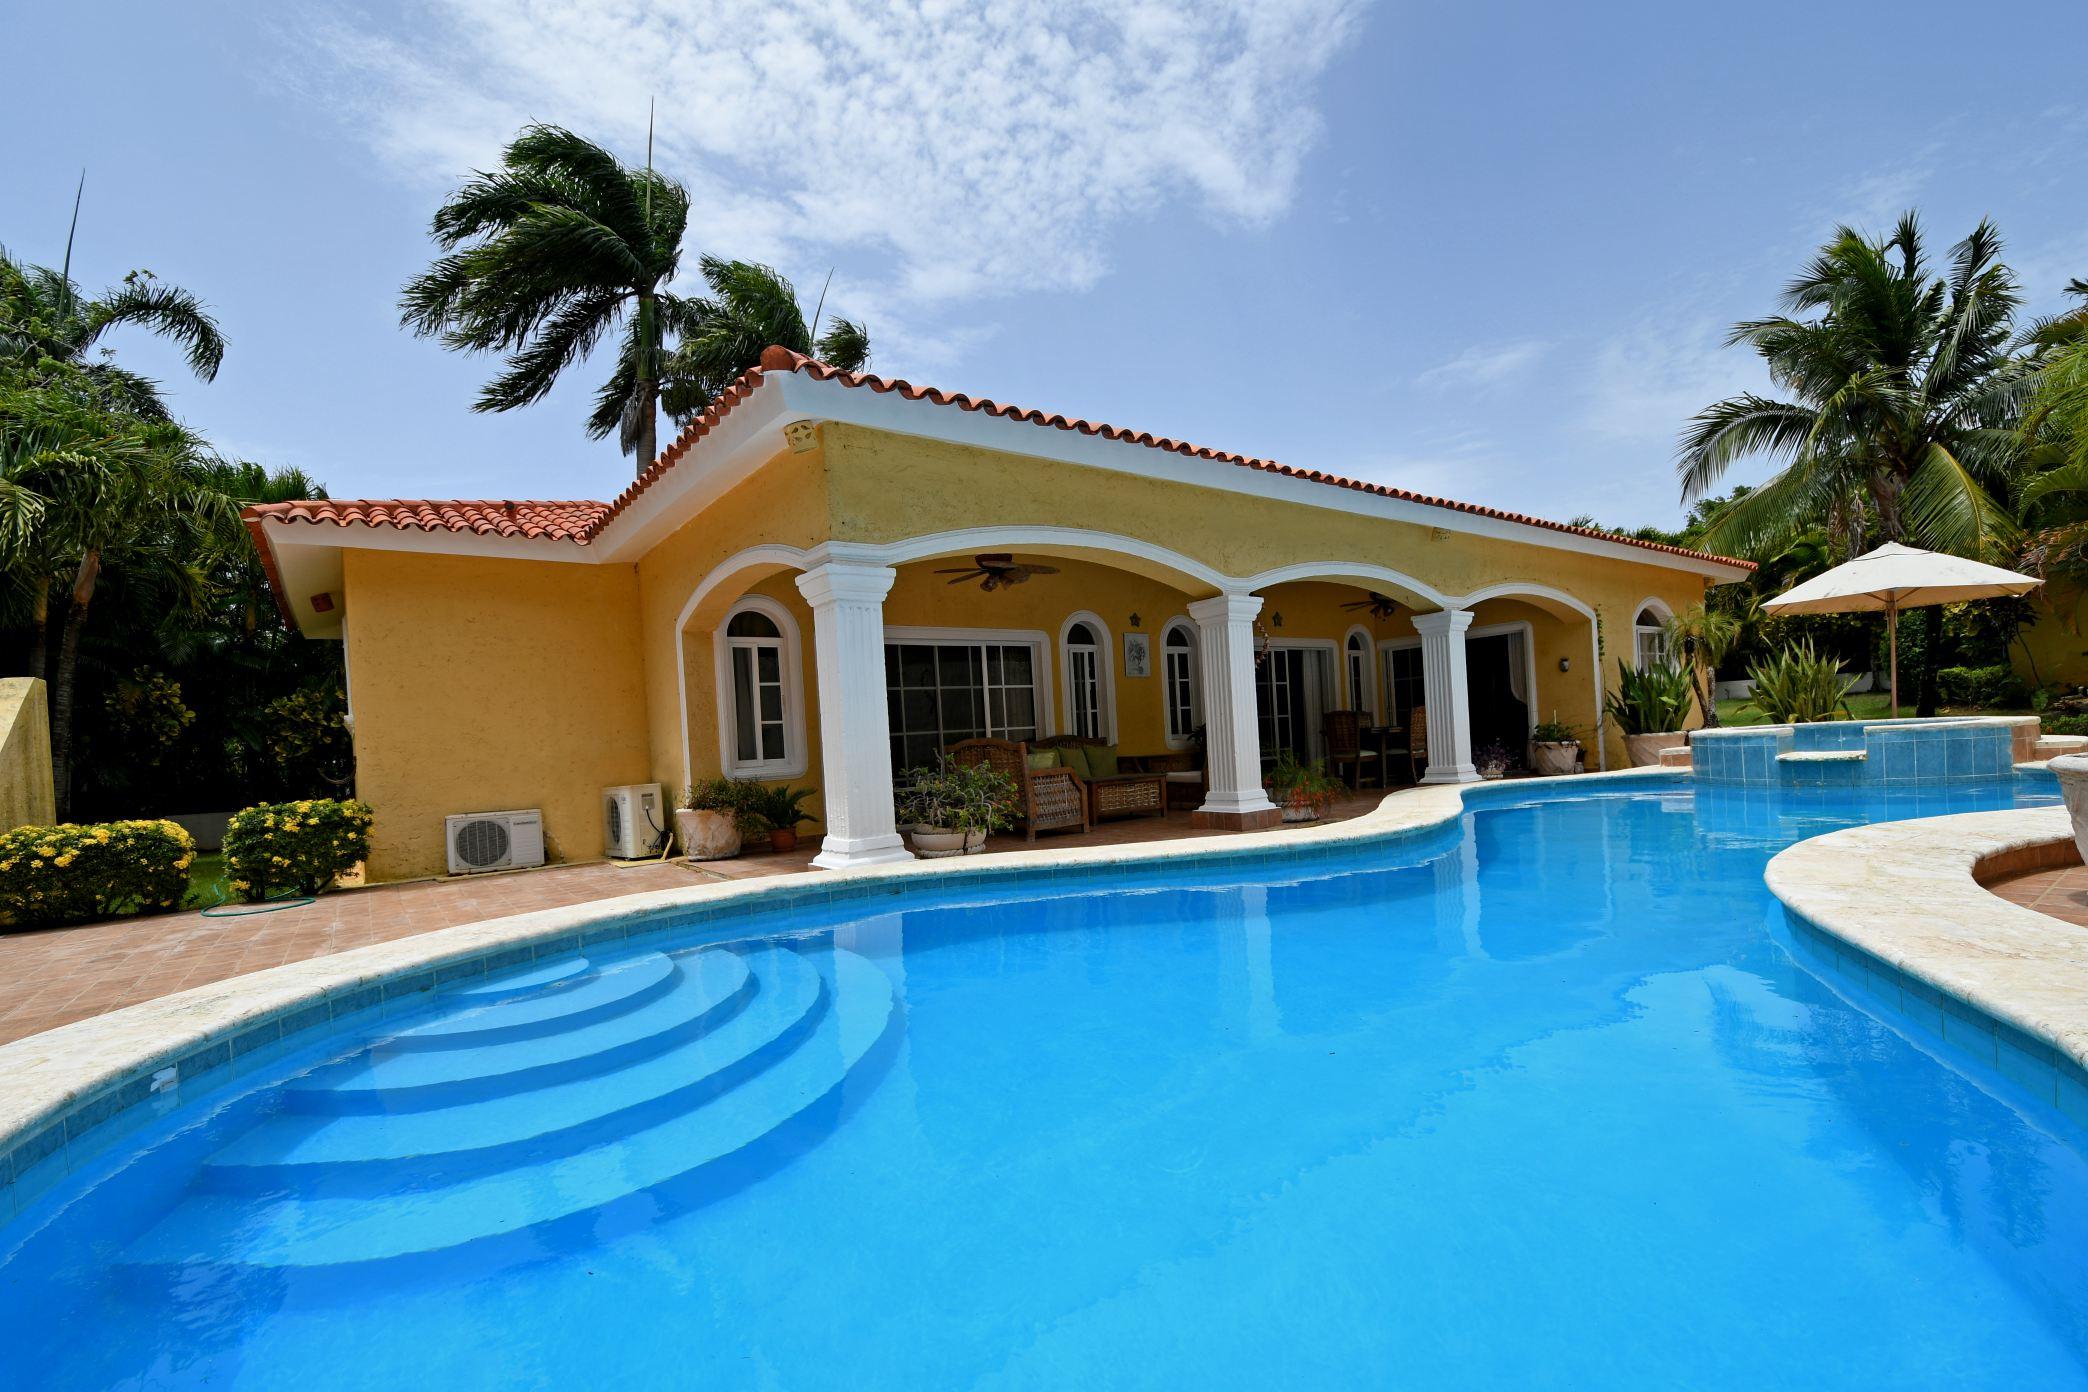 Villa de Renta Cerca de Playa Entre Sosua Cabarete